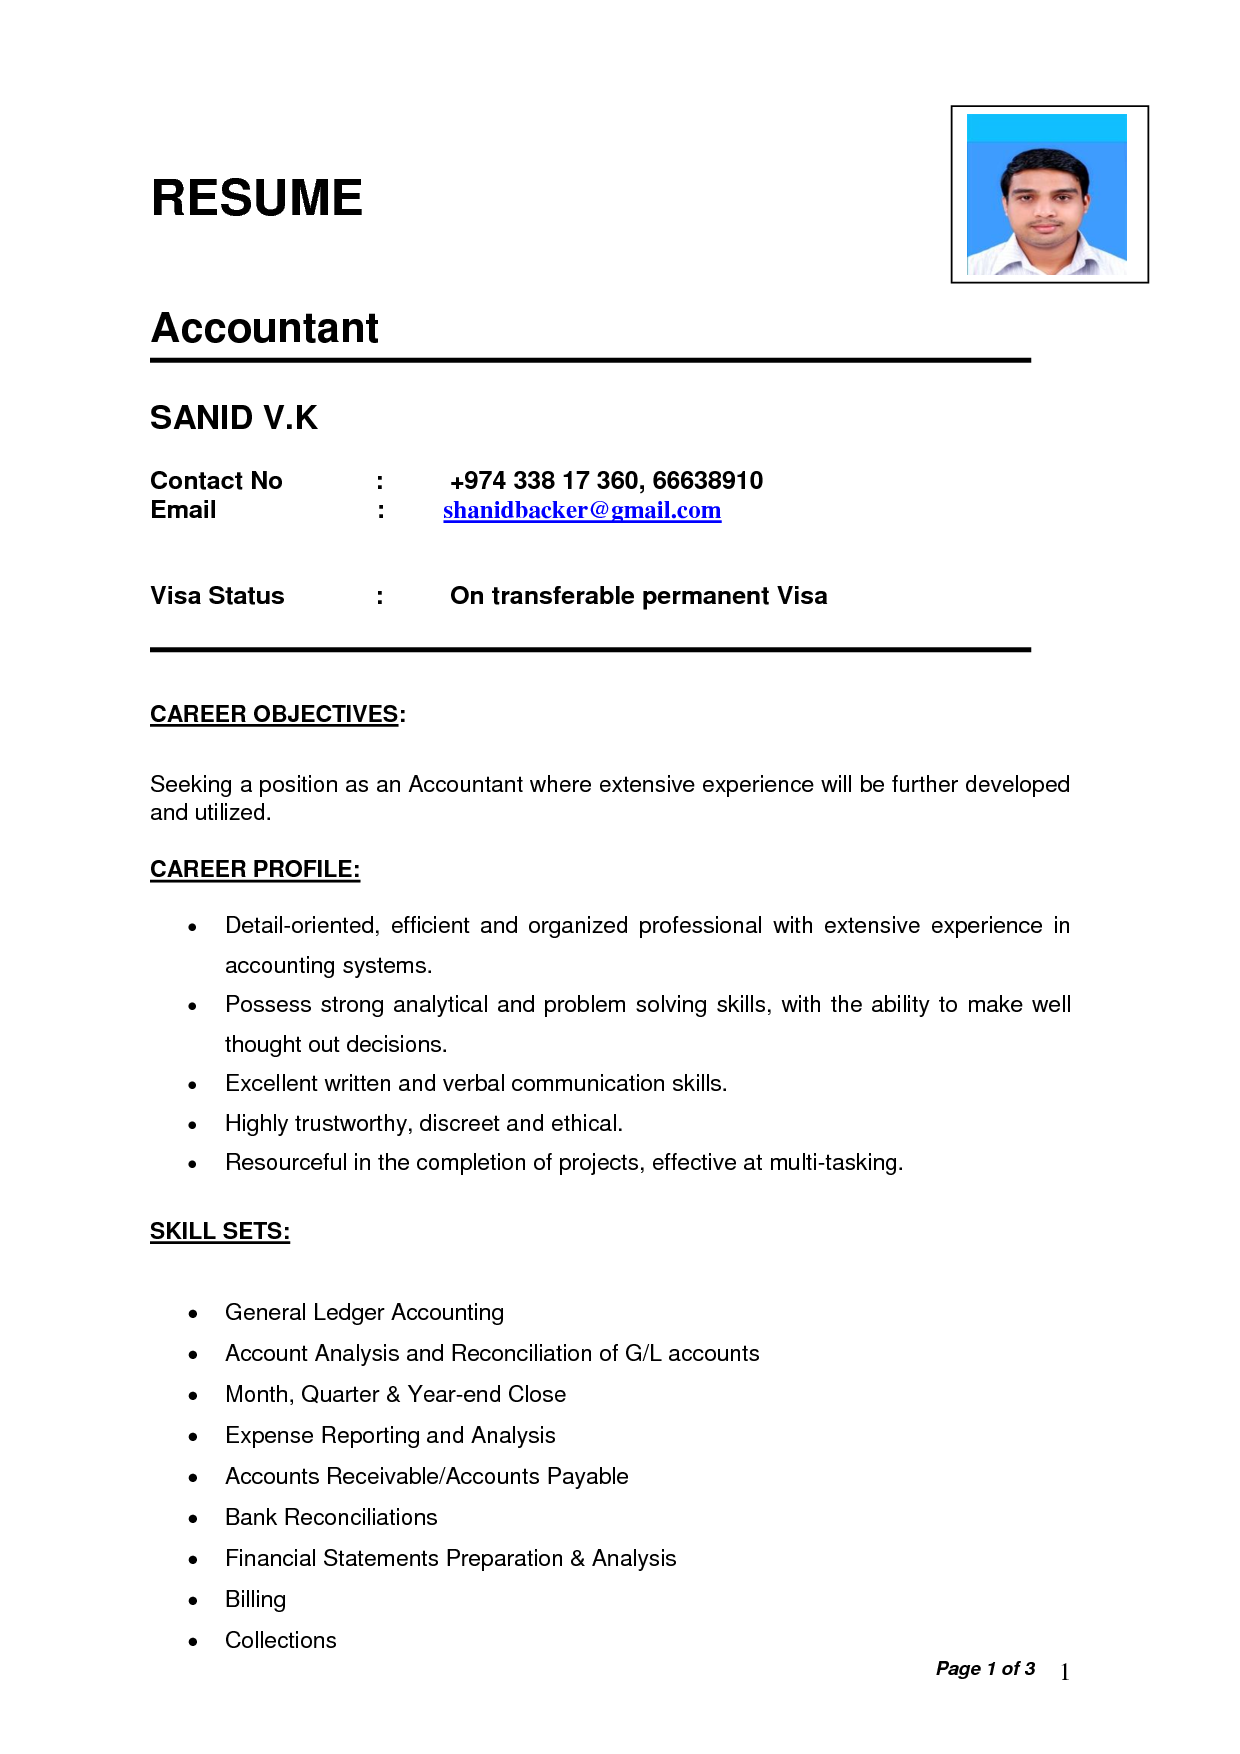 Resume Format India , format india resume ResumeFormat